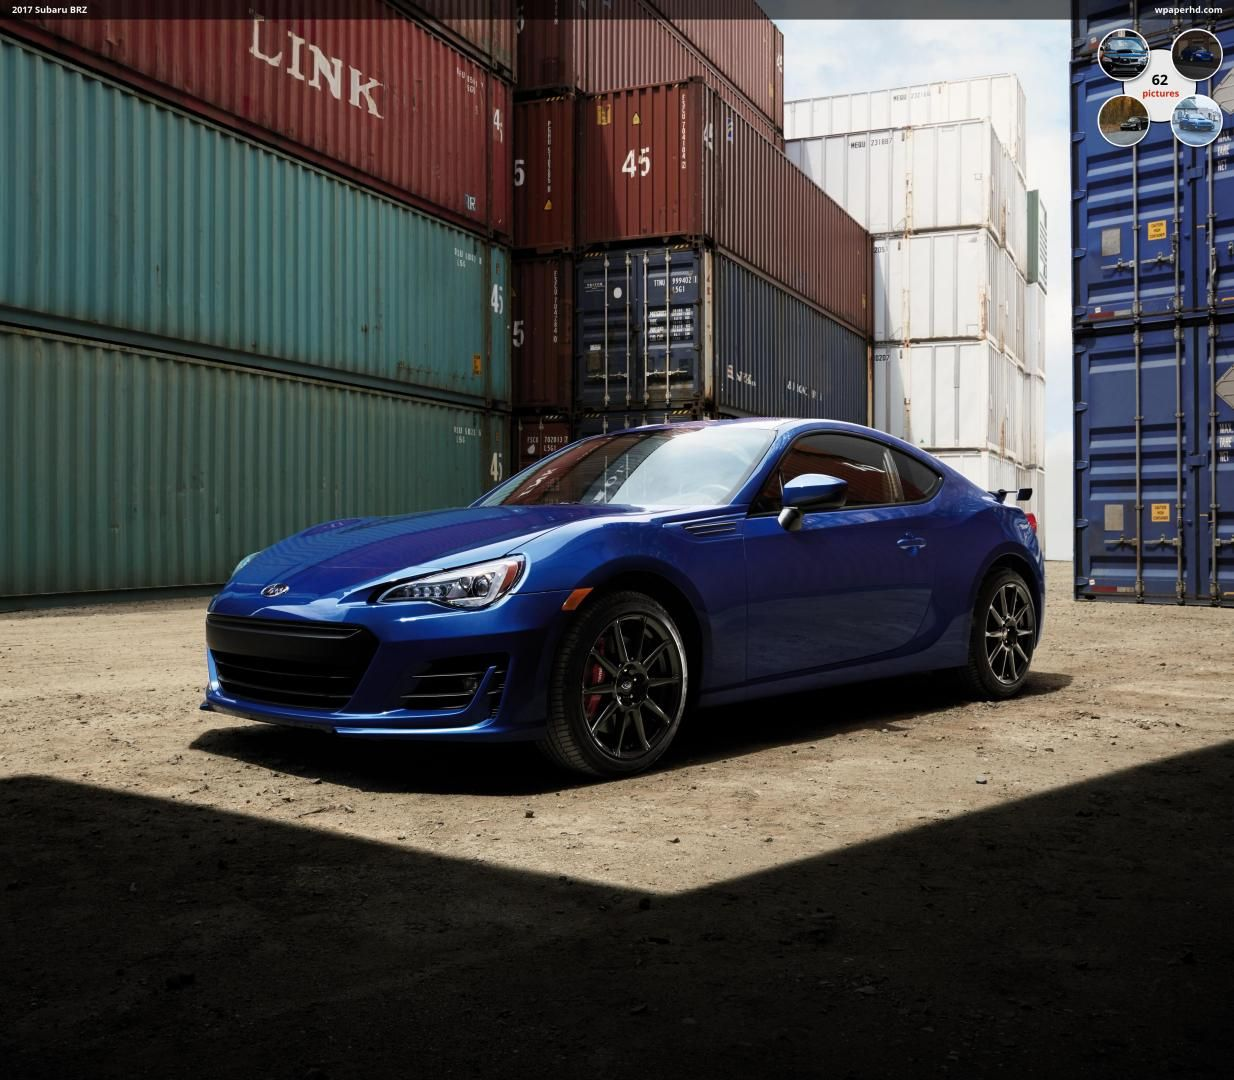 2017 Subaru BRZ Subaru, Subaru impreza, Sports sedan